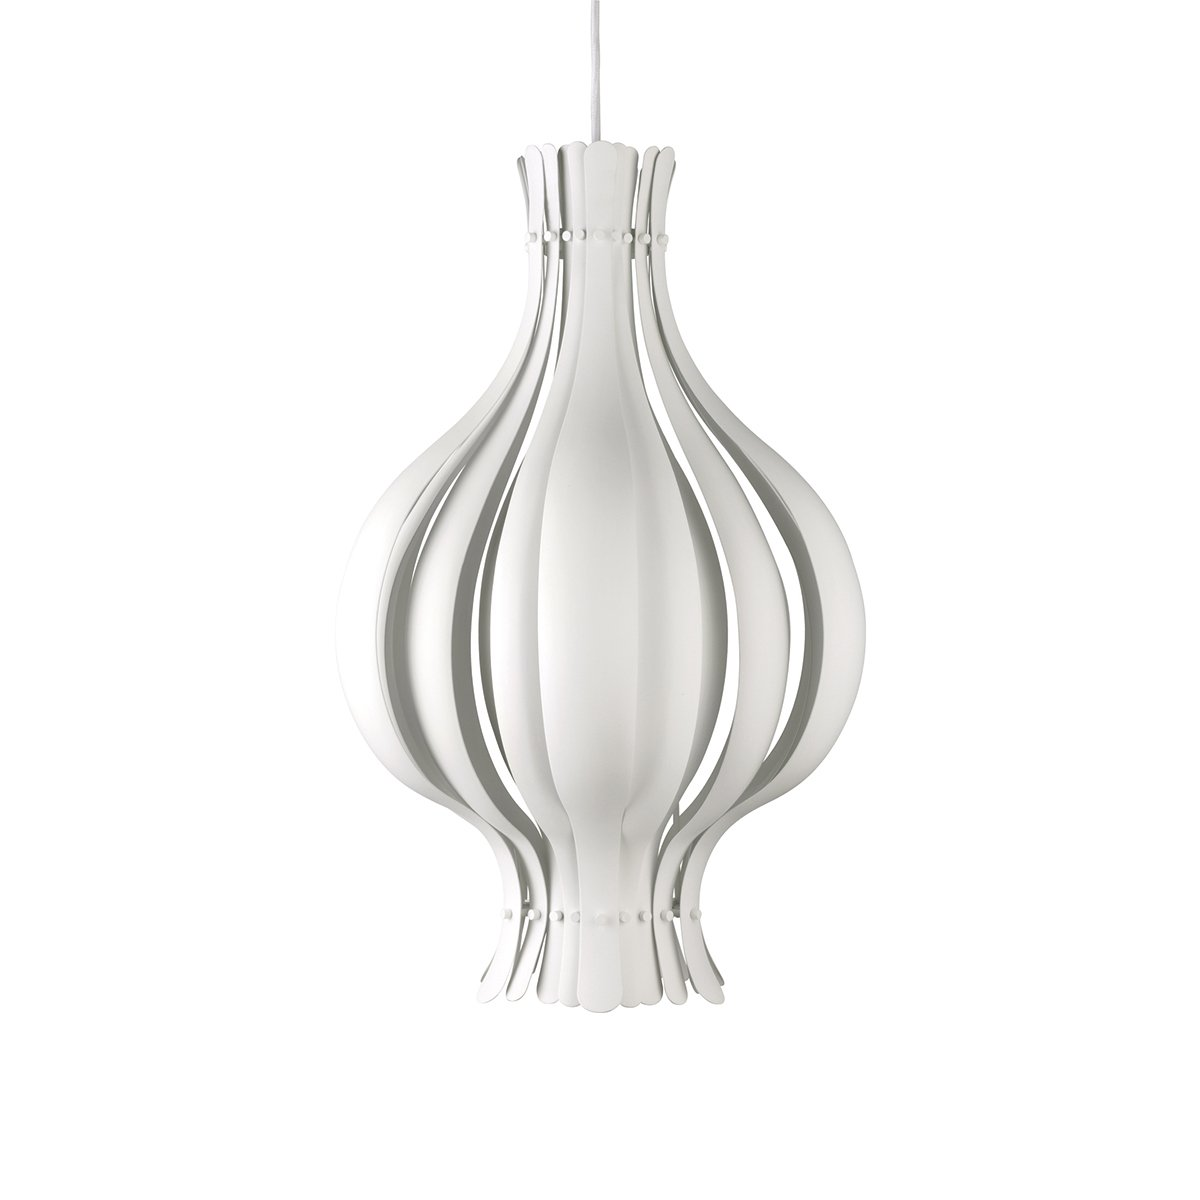 Verpan Onion Hanglamp